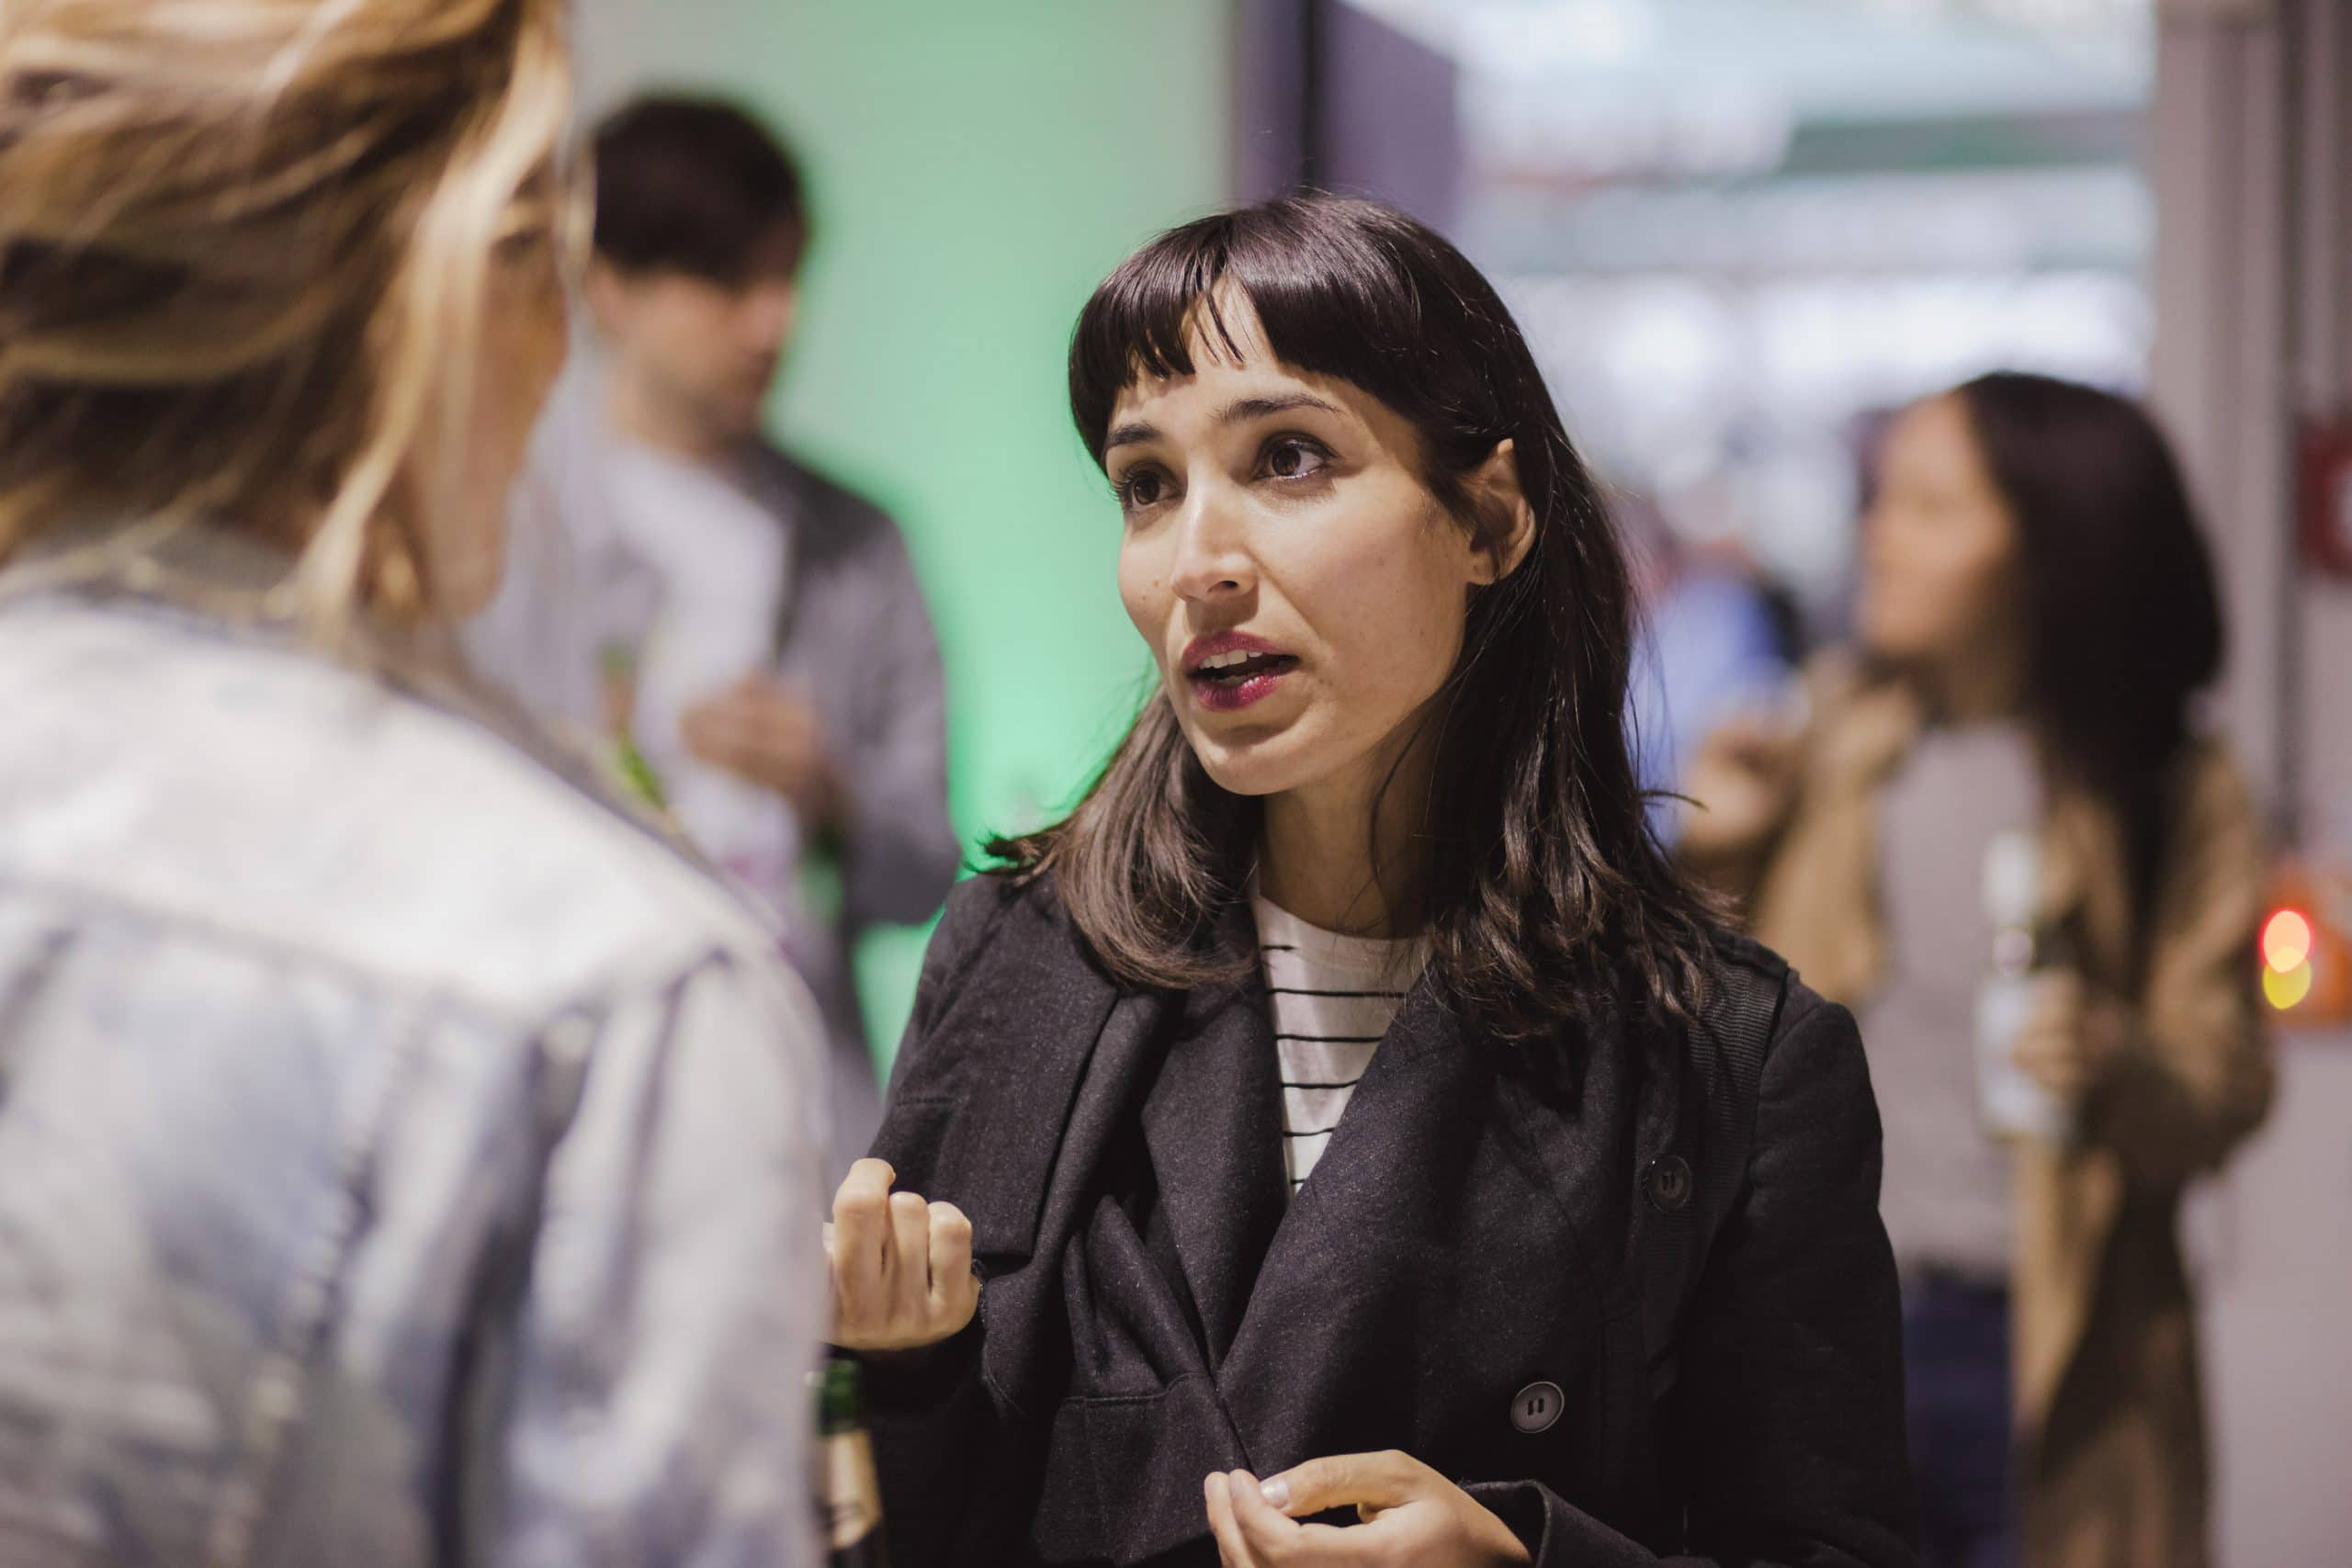 re:publica 2018 | Station Berlin – 03.05.2018